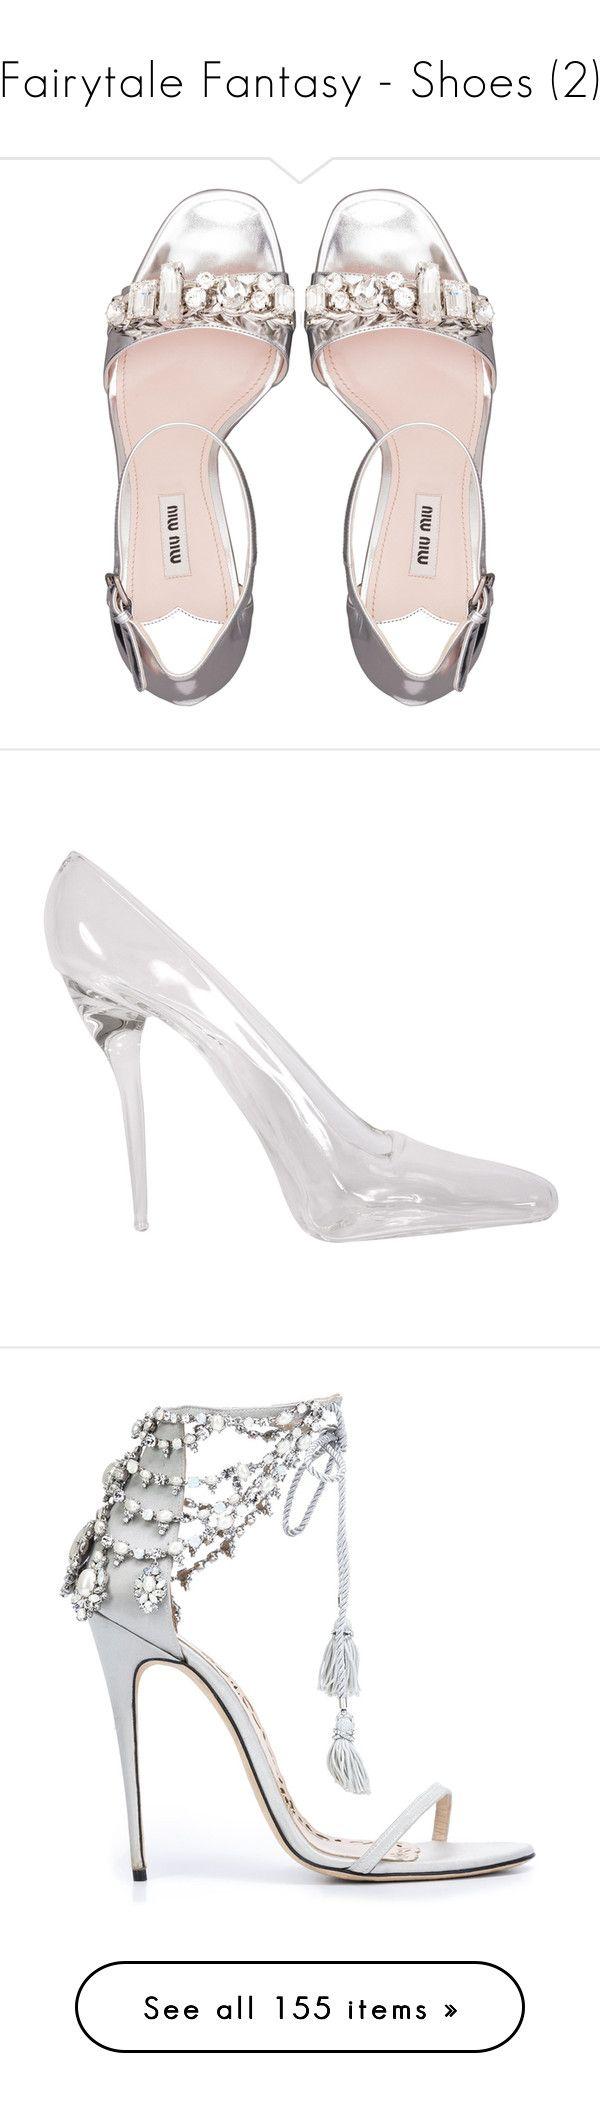 Silver sandals or shoes - Silver High Heel Sandals Silver Heels Sandal Heels Heeled Sandals Shoes Sandals Fairytale Fantasies Platform Shoes Fantasy Miu Miu